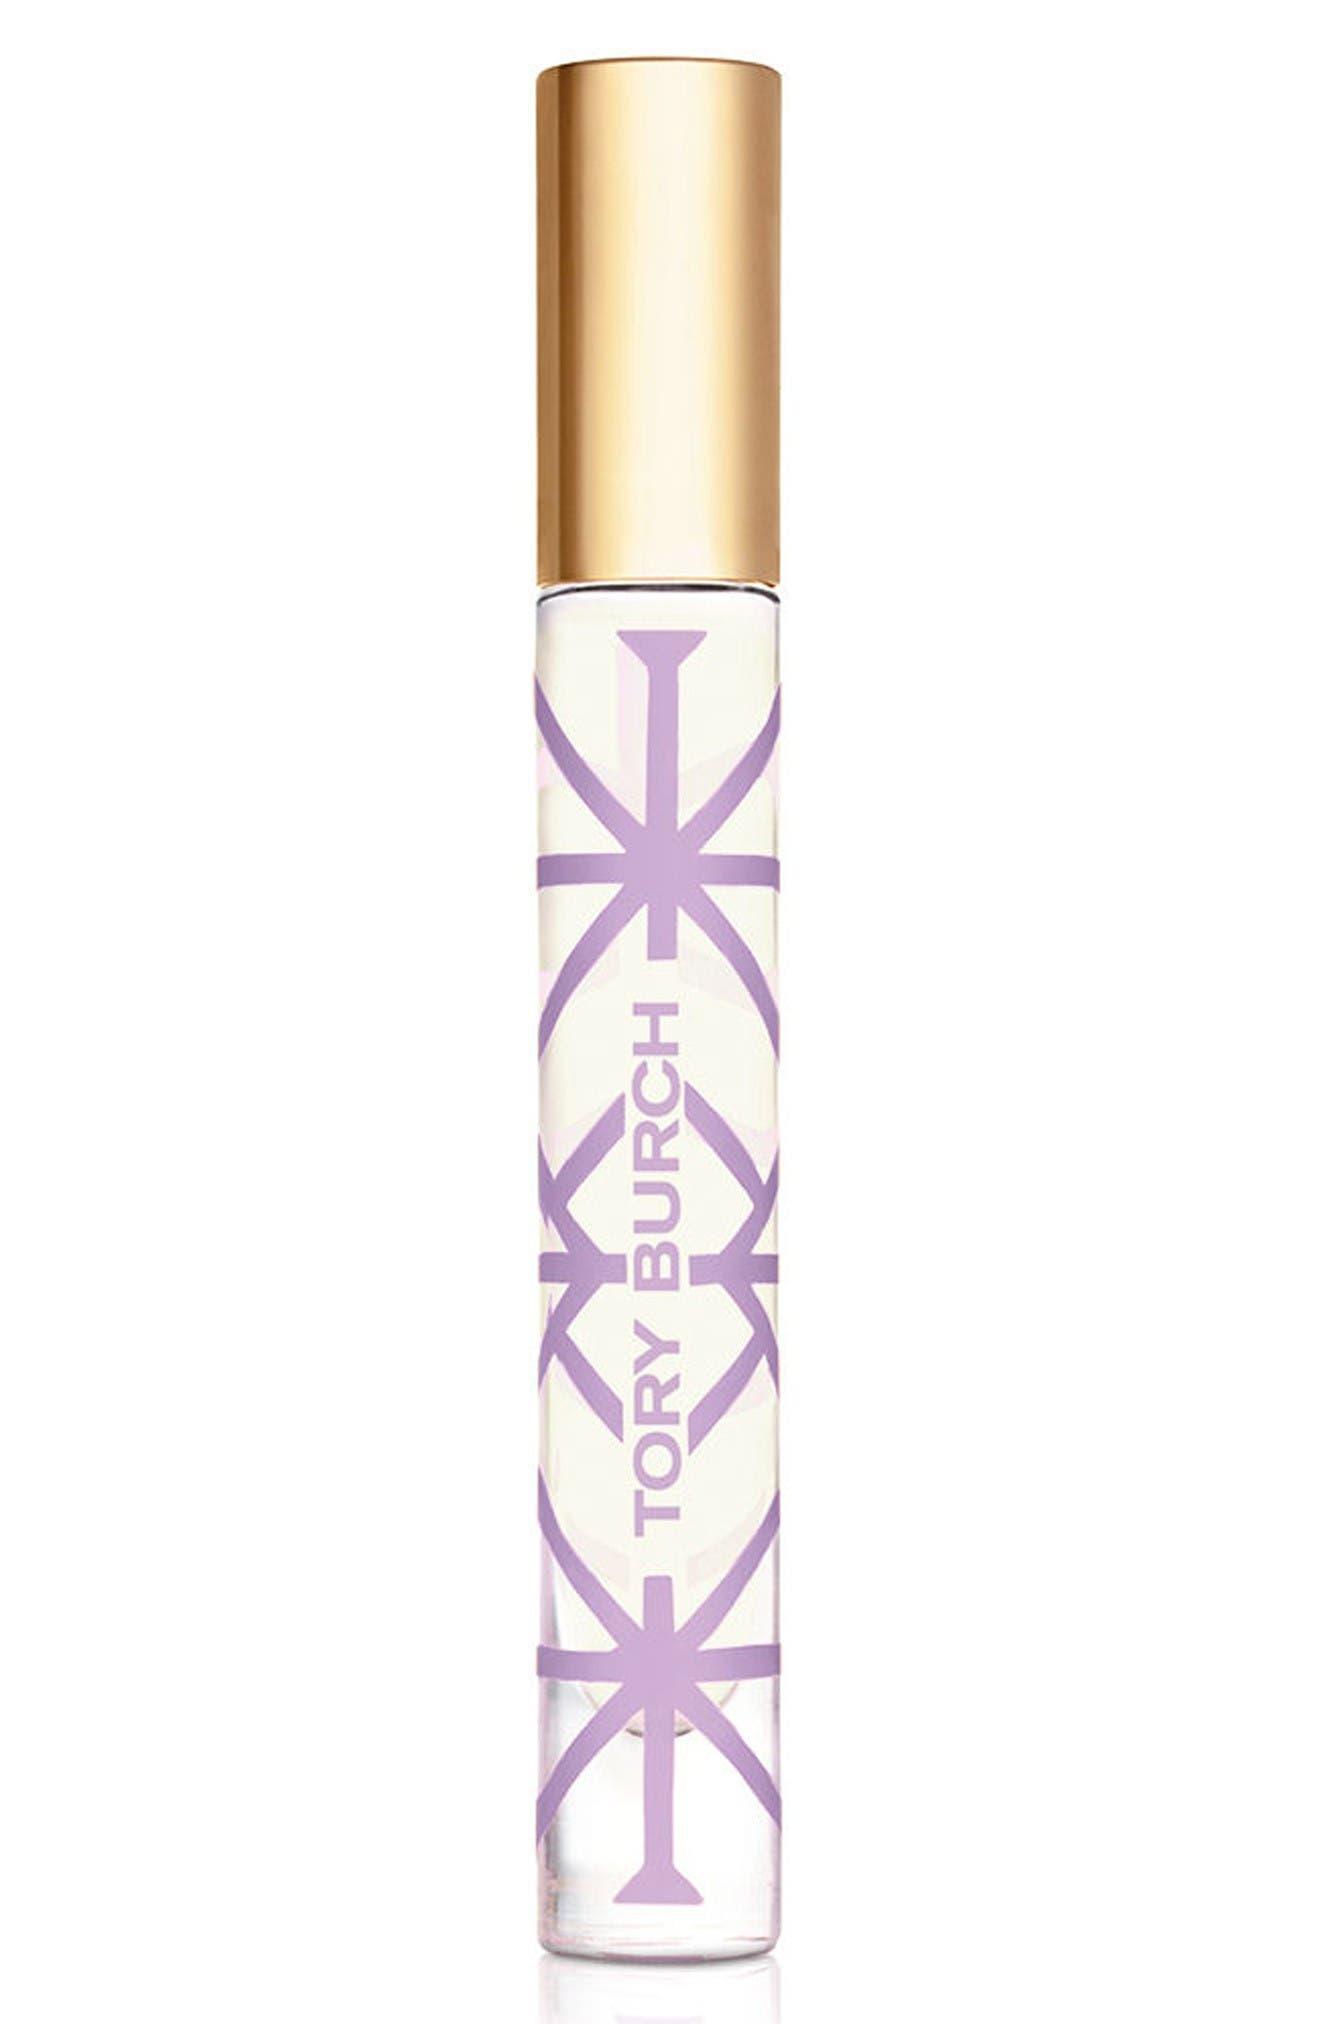 Main Image - Tory Burch Jolie Fleur Lavande Eau de Parfum Rollerball